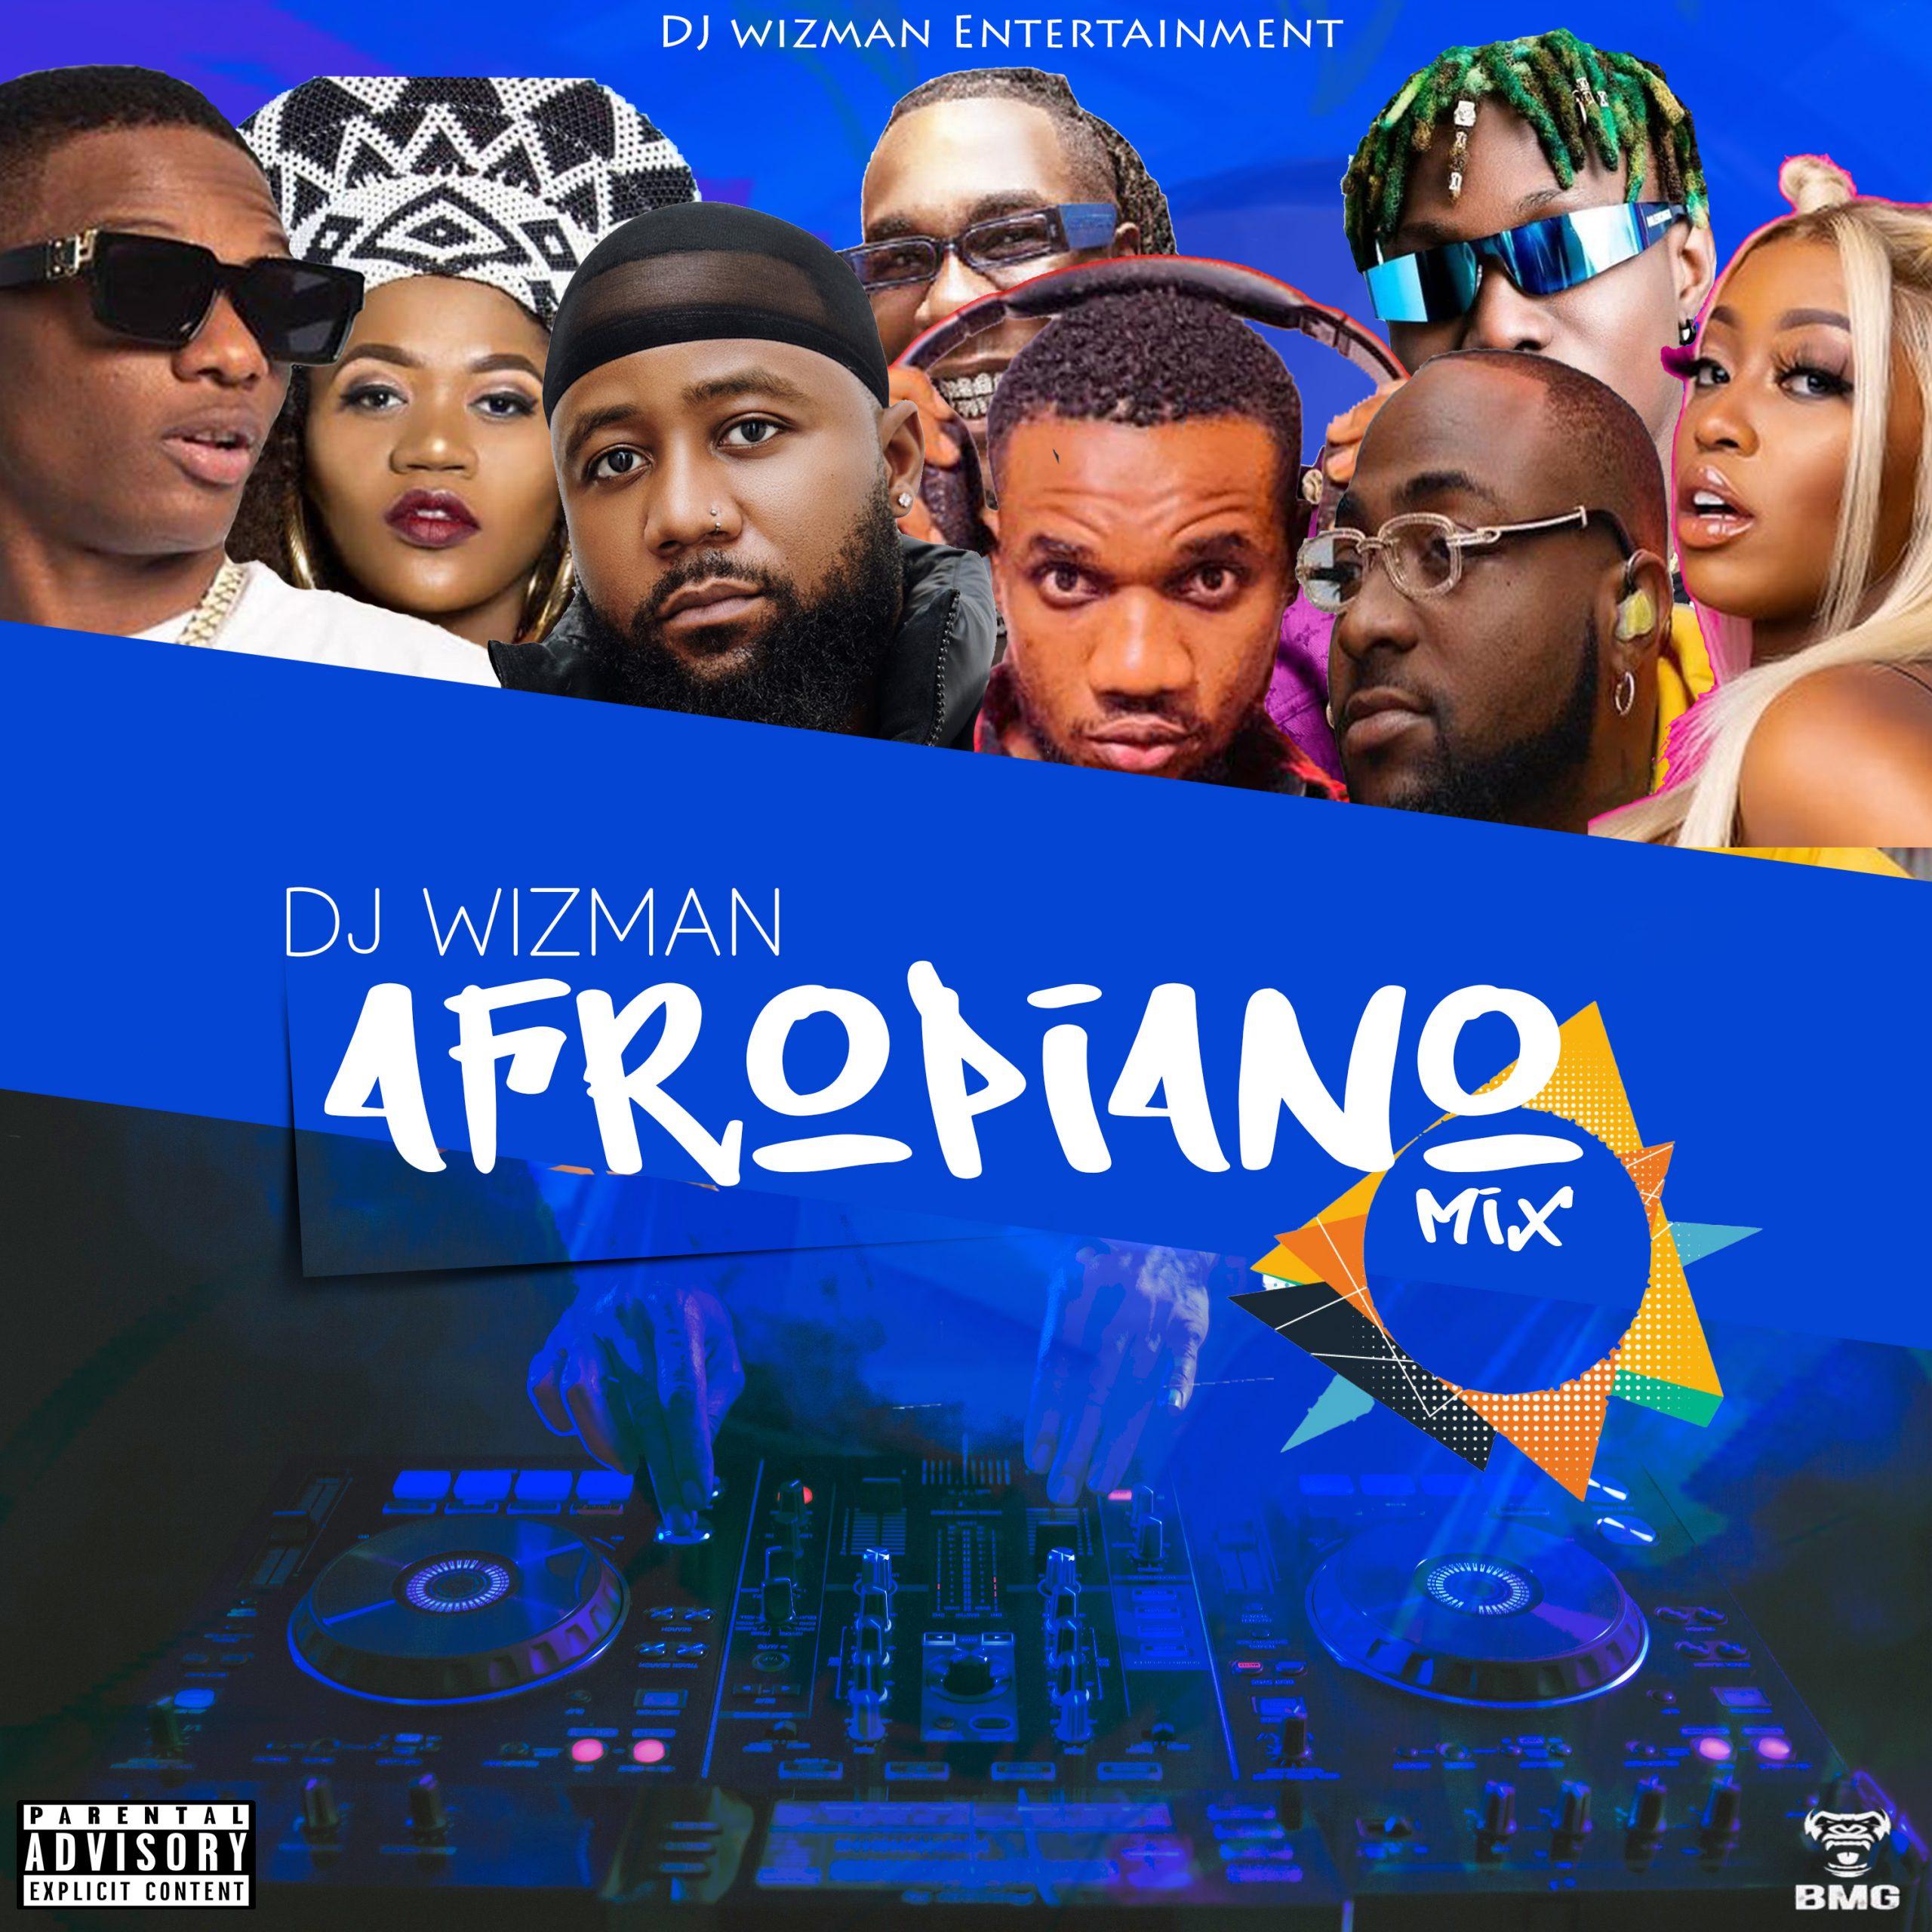 DJ MIXTAPE: DJ Wizman - Afropiano Mix